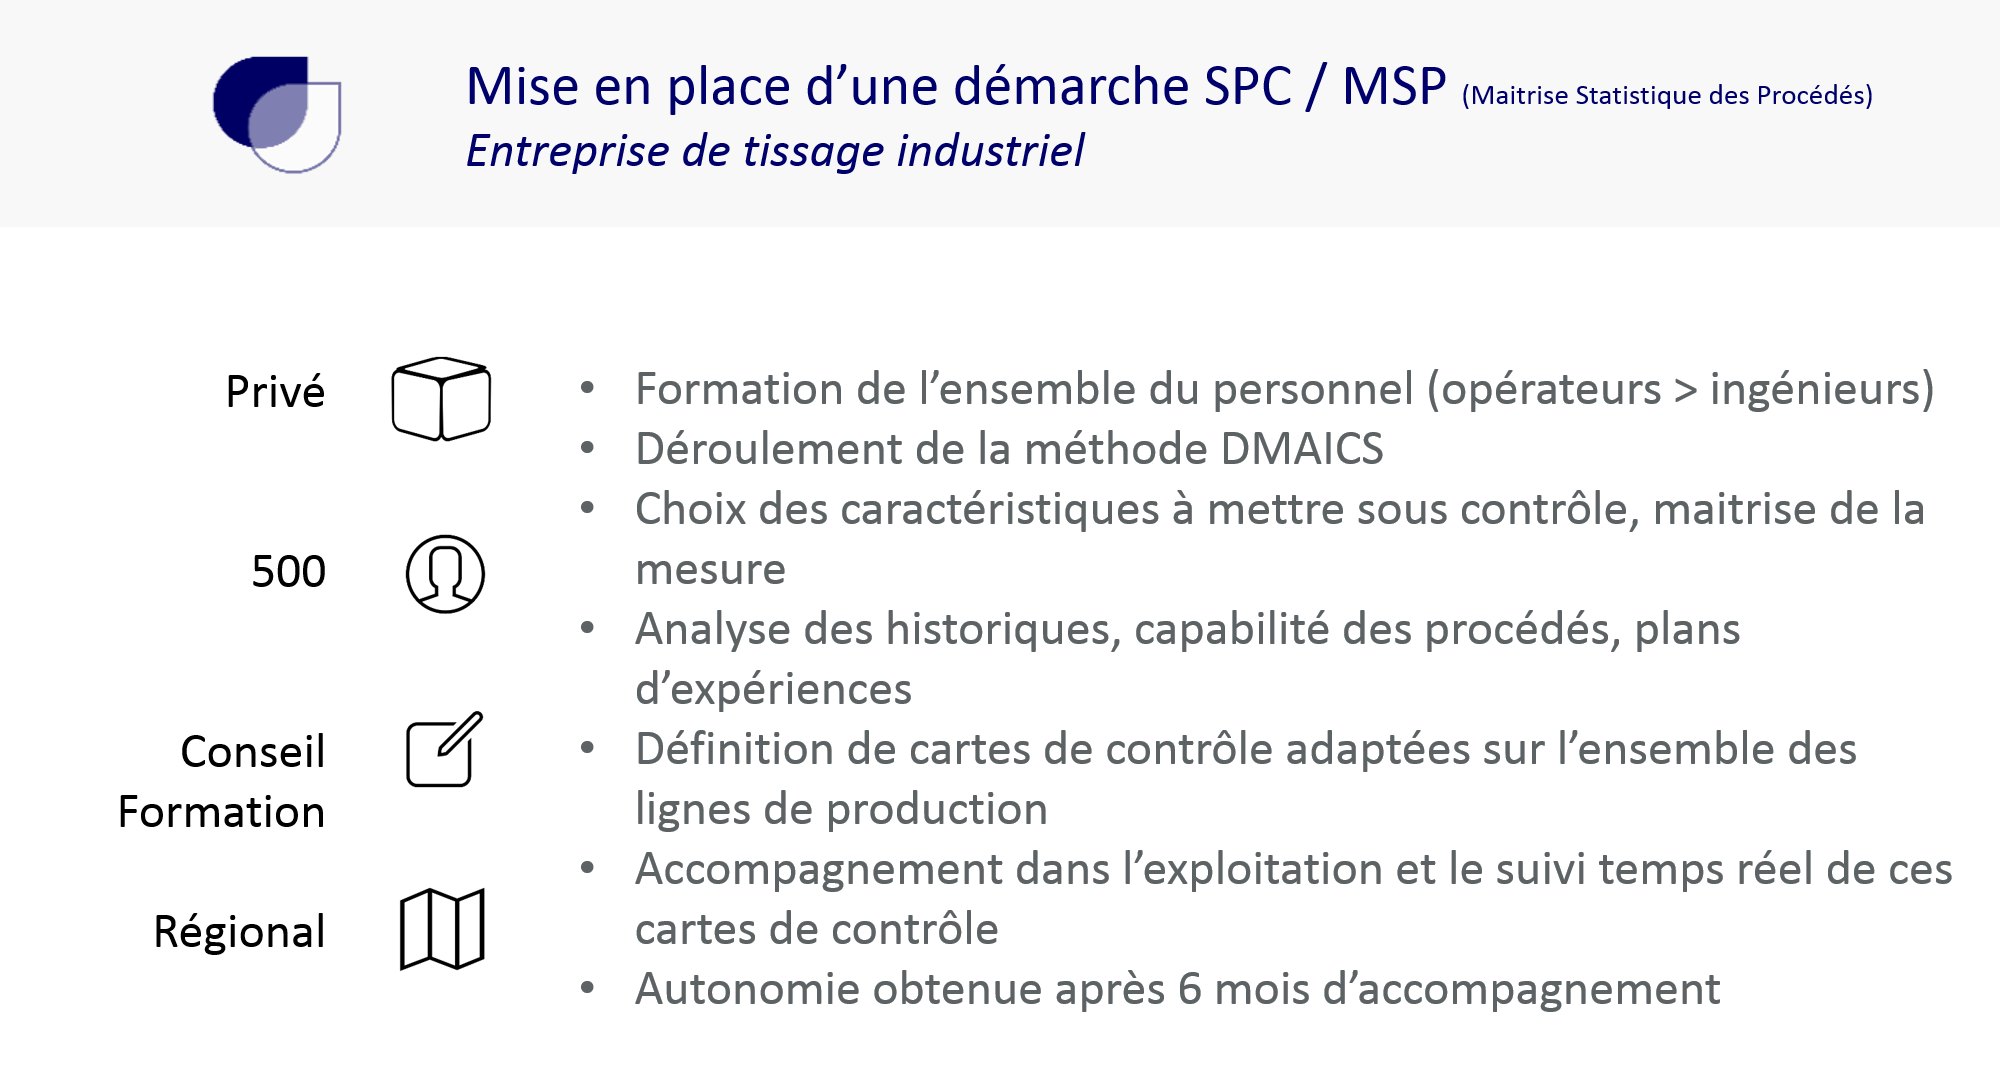 Ref SPC MSP